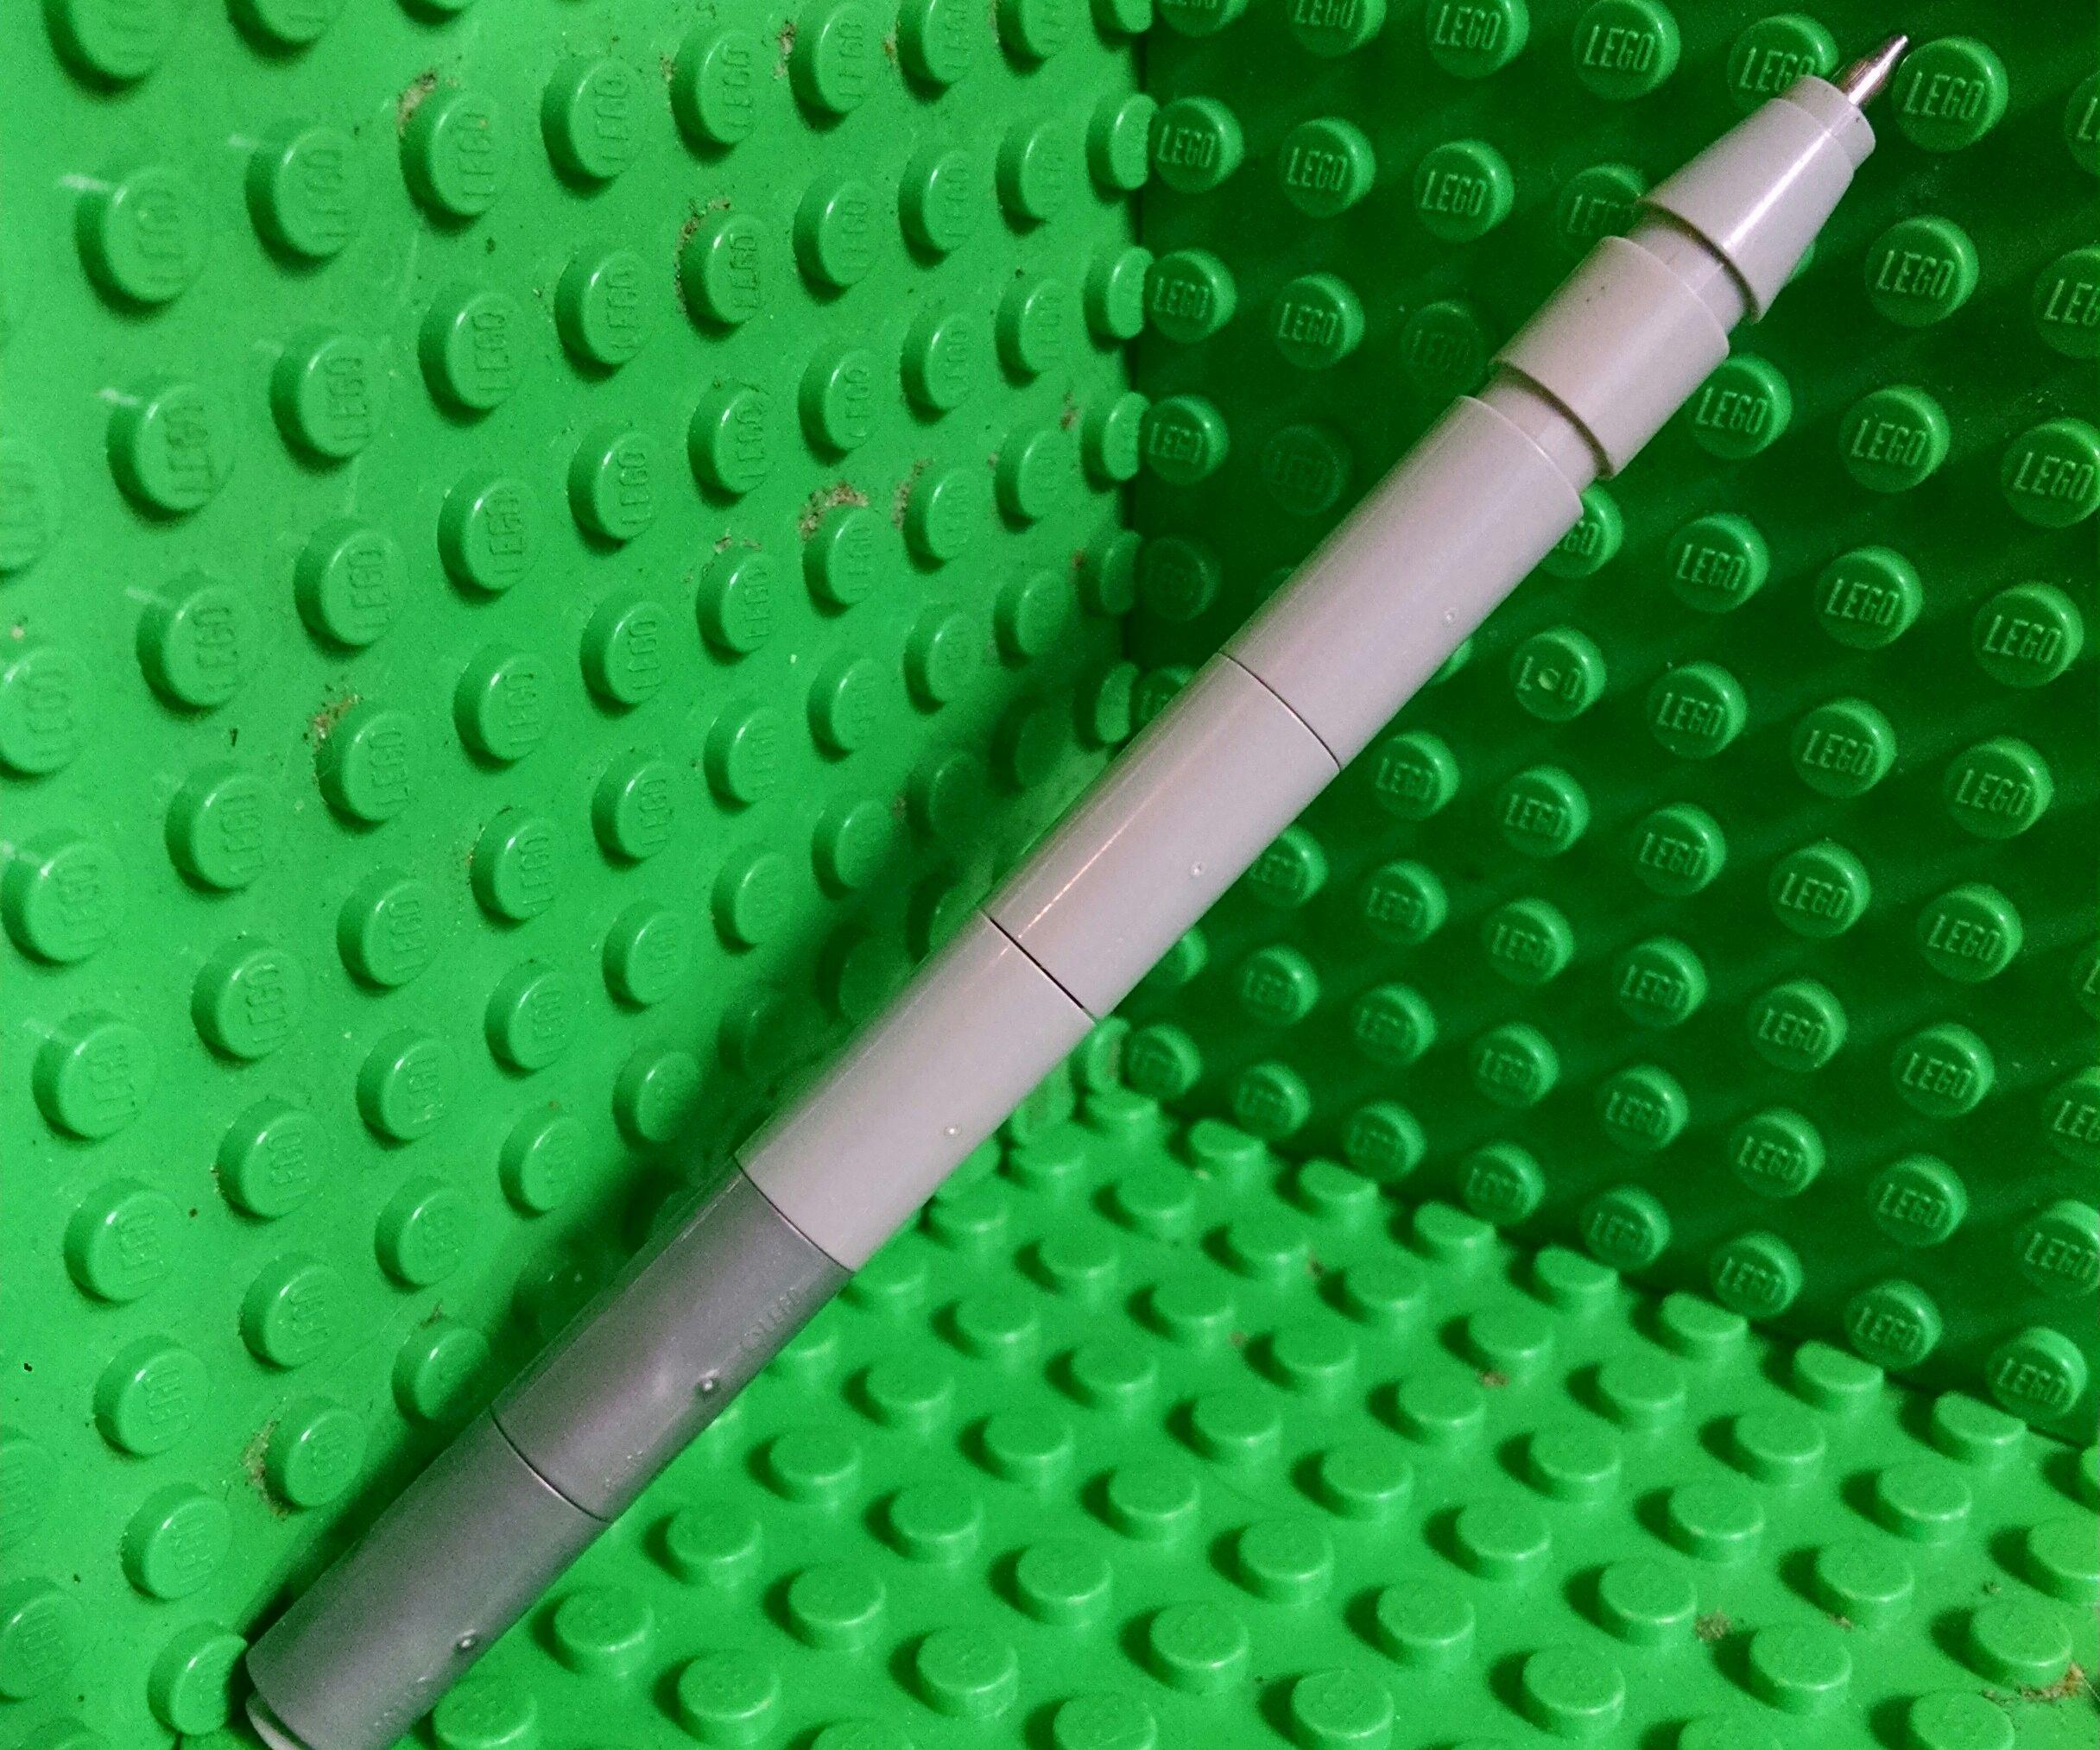 DIY LEGO Pen